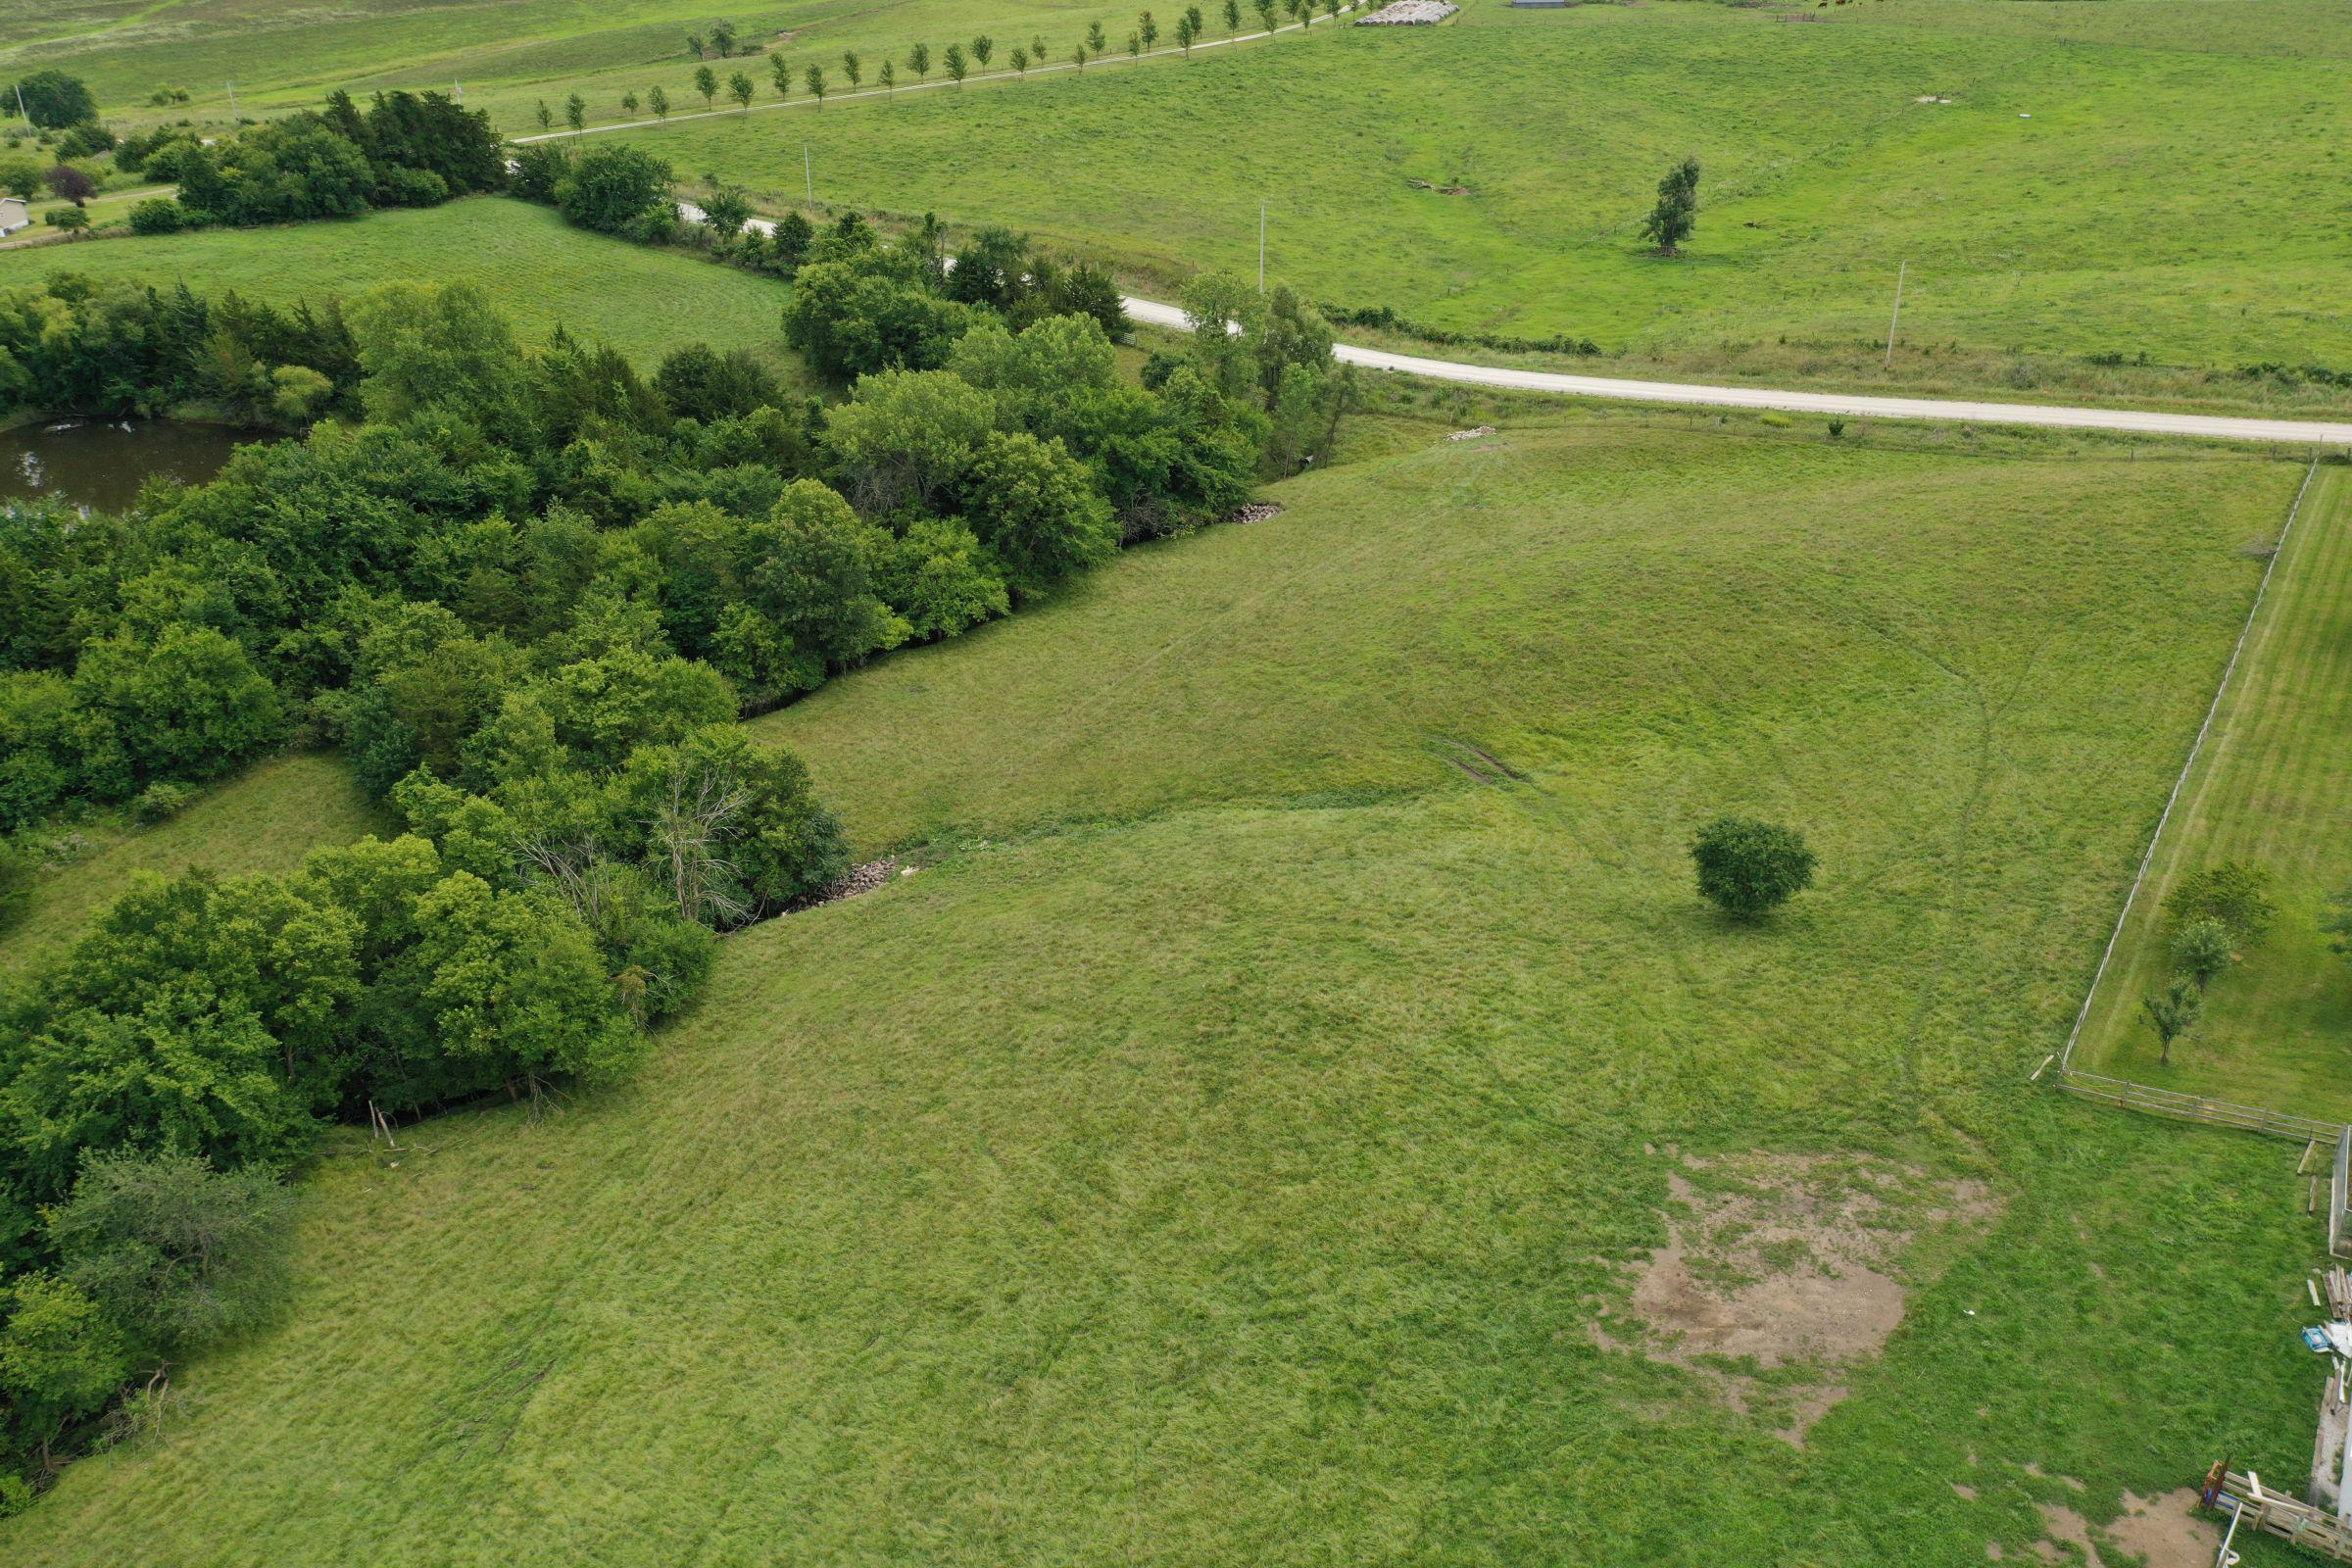 residential-warren-county-iowa-12-acres-listing-number-15104-3-2020-08-08-185051.jpg